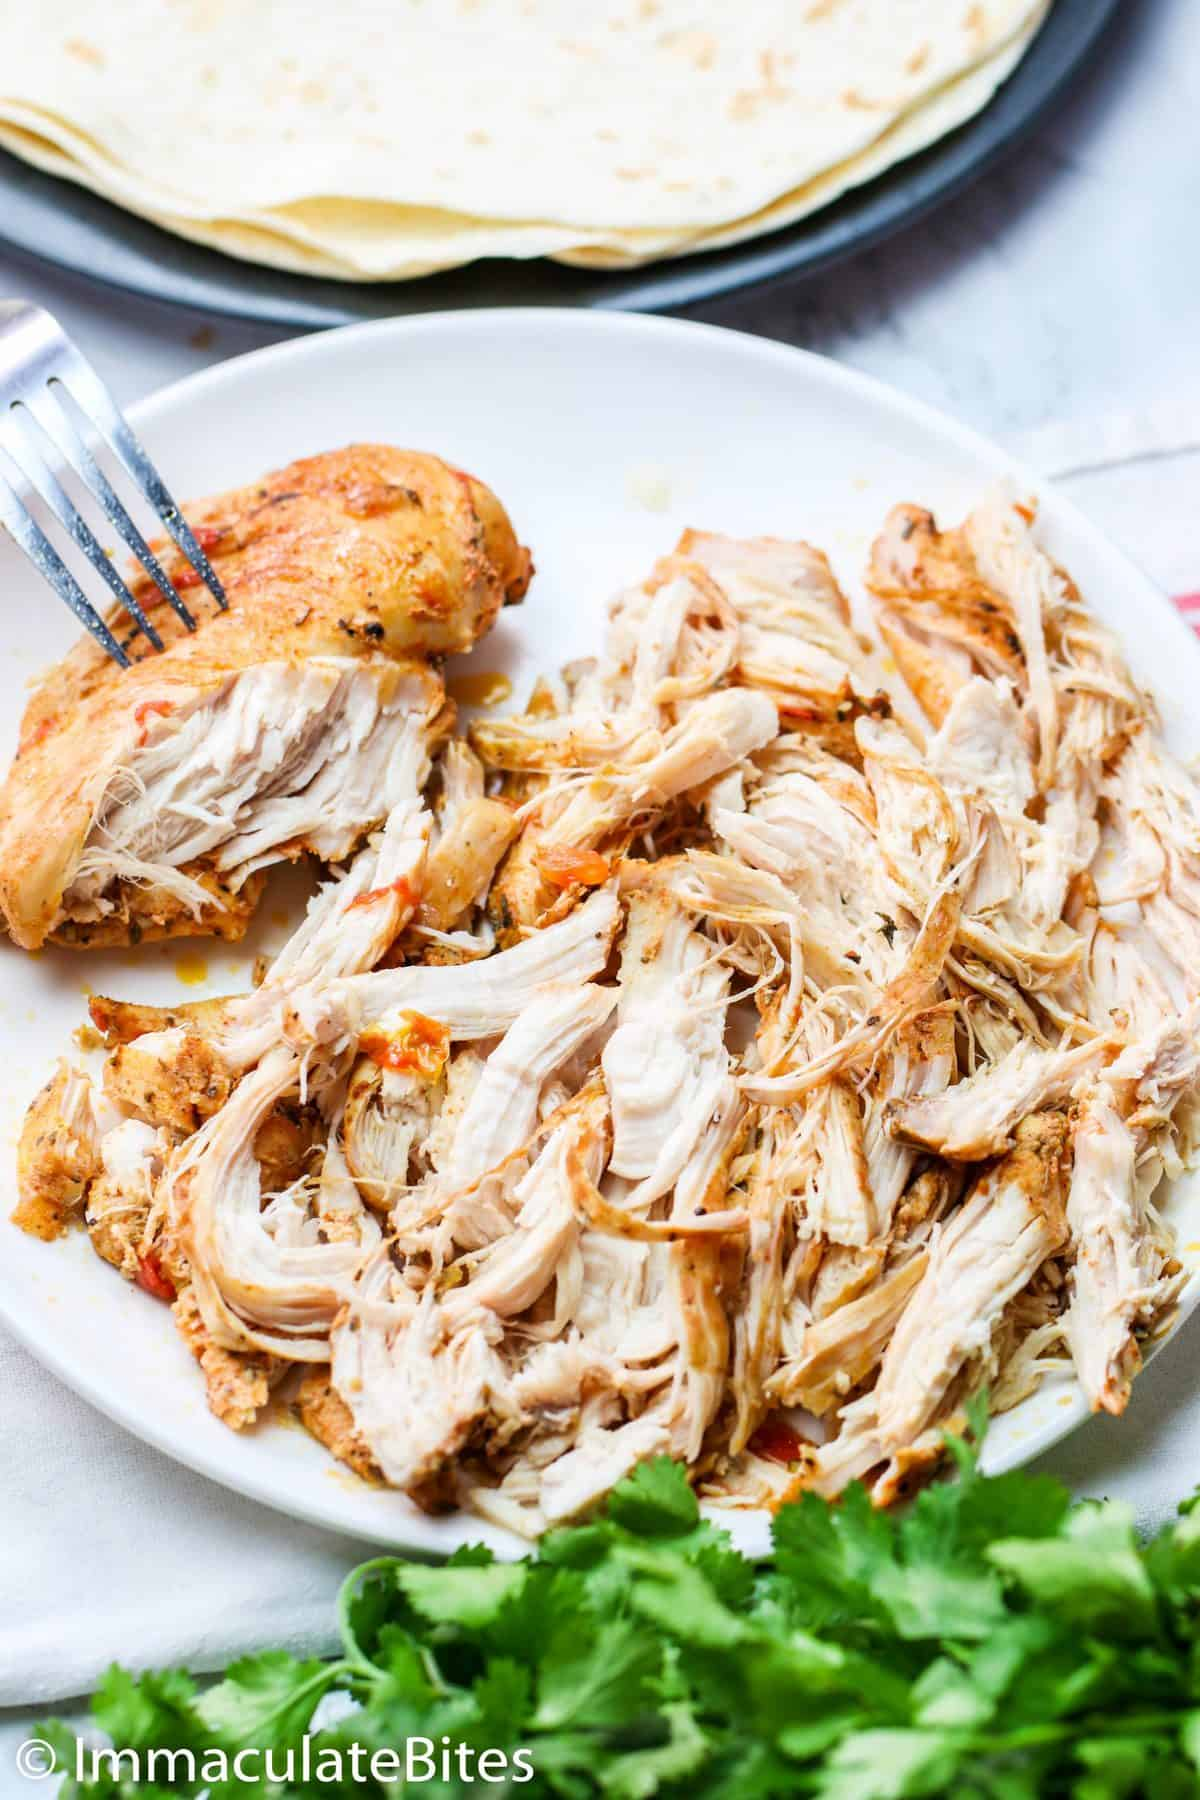 Shredded Chicken Using Fork